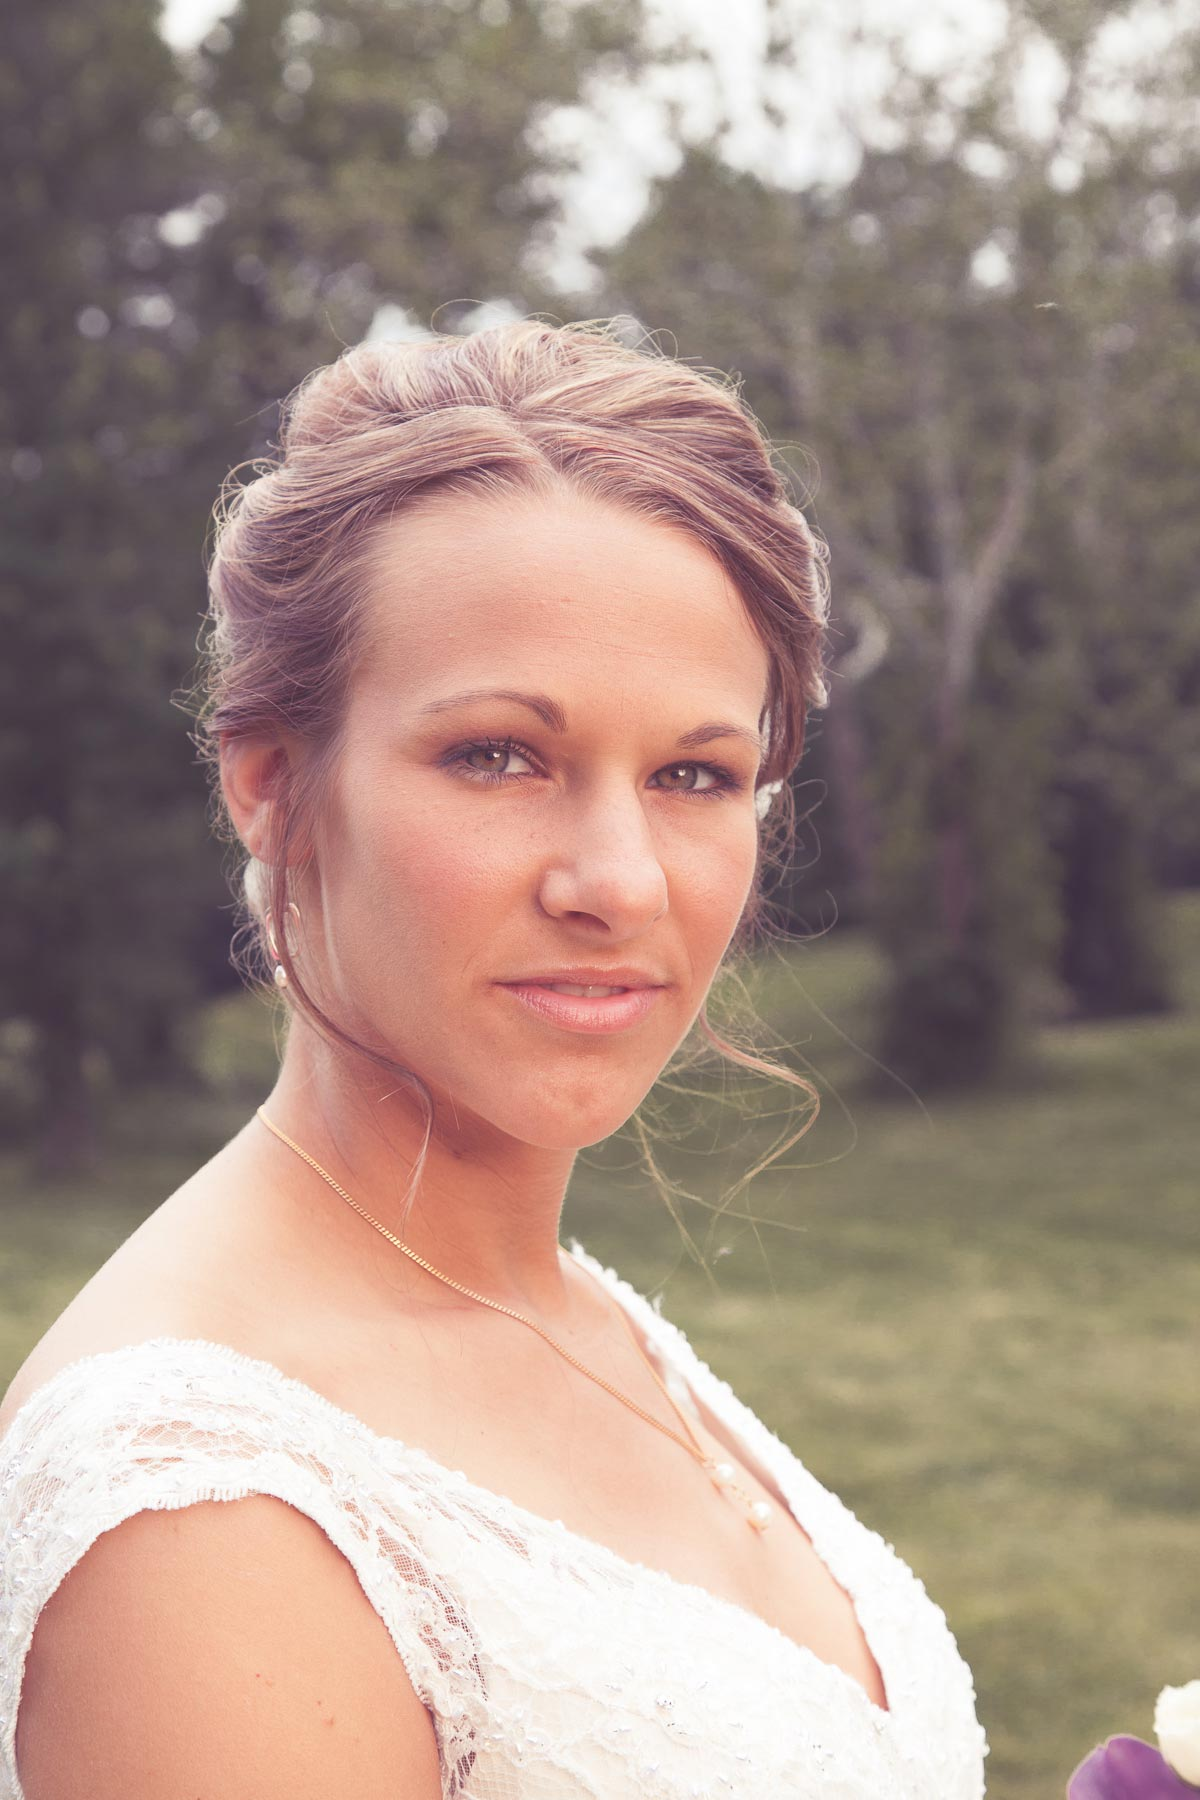 evansville-wedding-photographer-pabst-photo-kokies-echo-valley-(47)